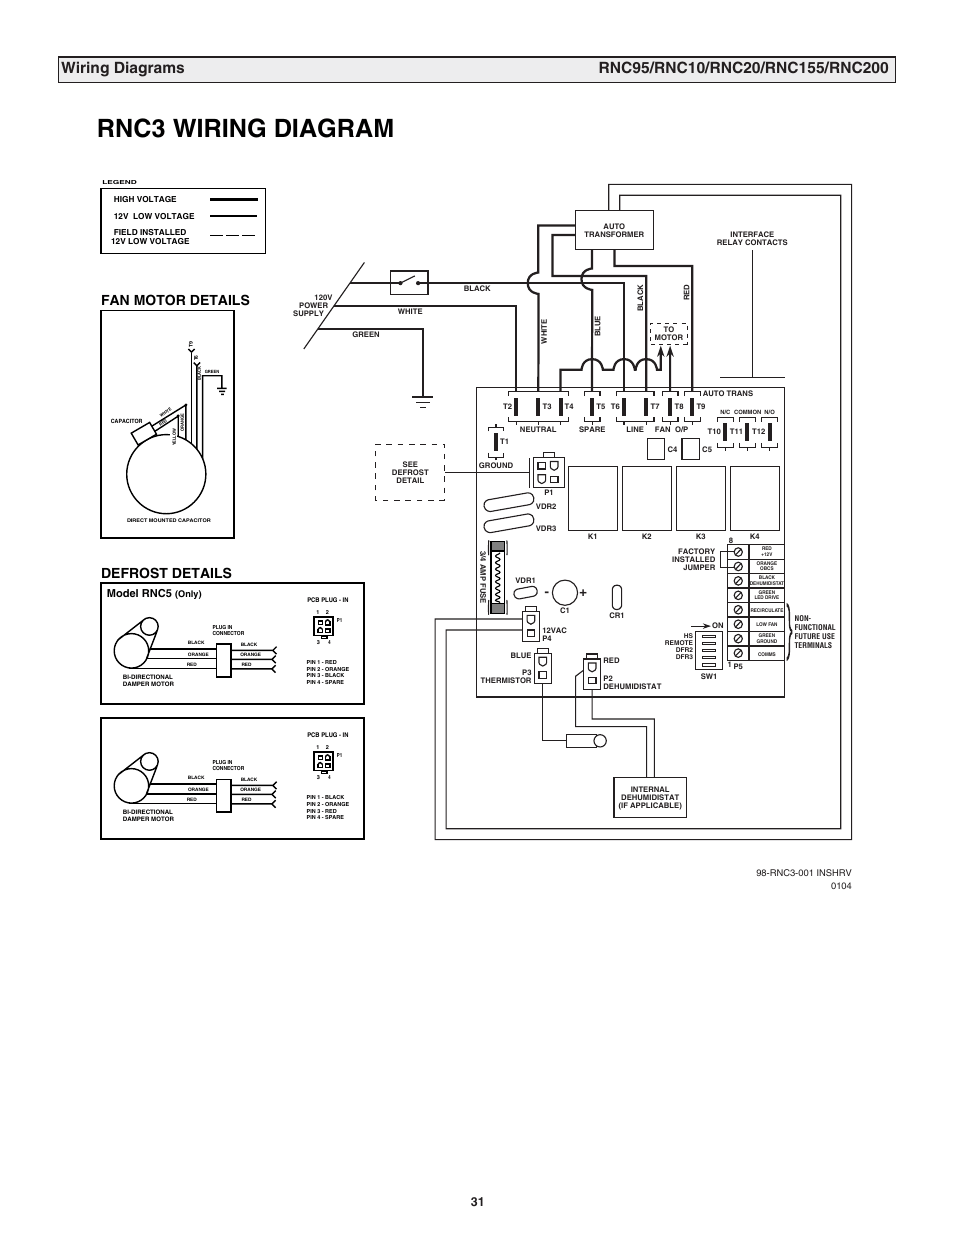 hight resolution of rnc3 wiring diagram fan motor details defrost details model rnc5 lifebreath rnc120d